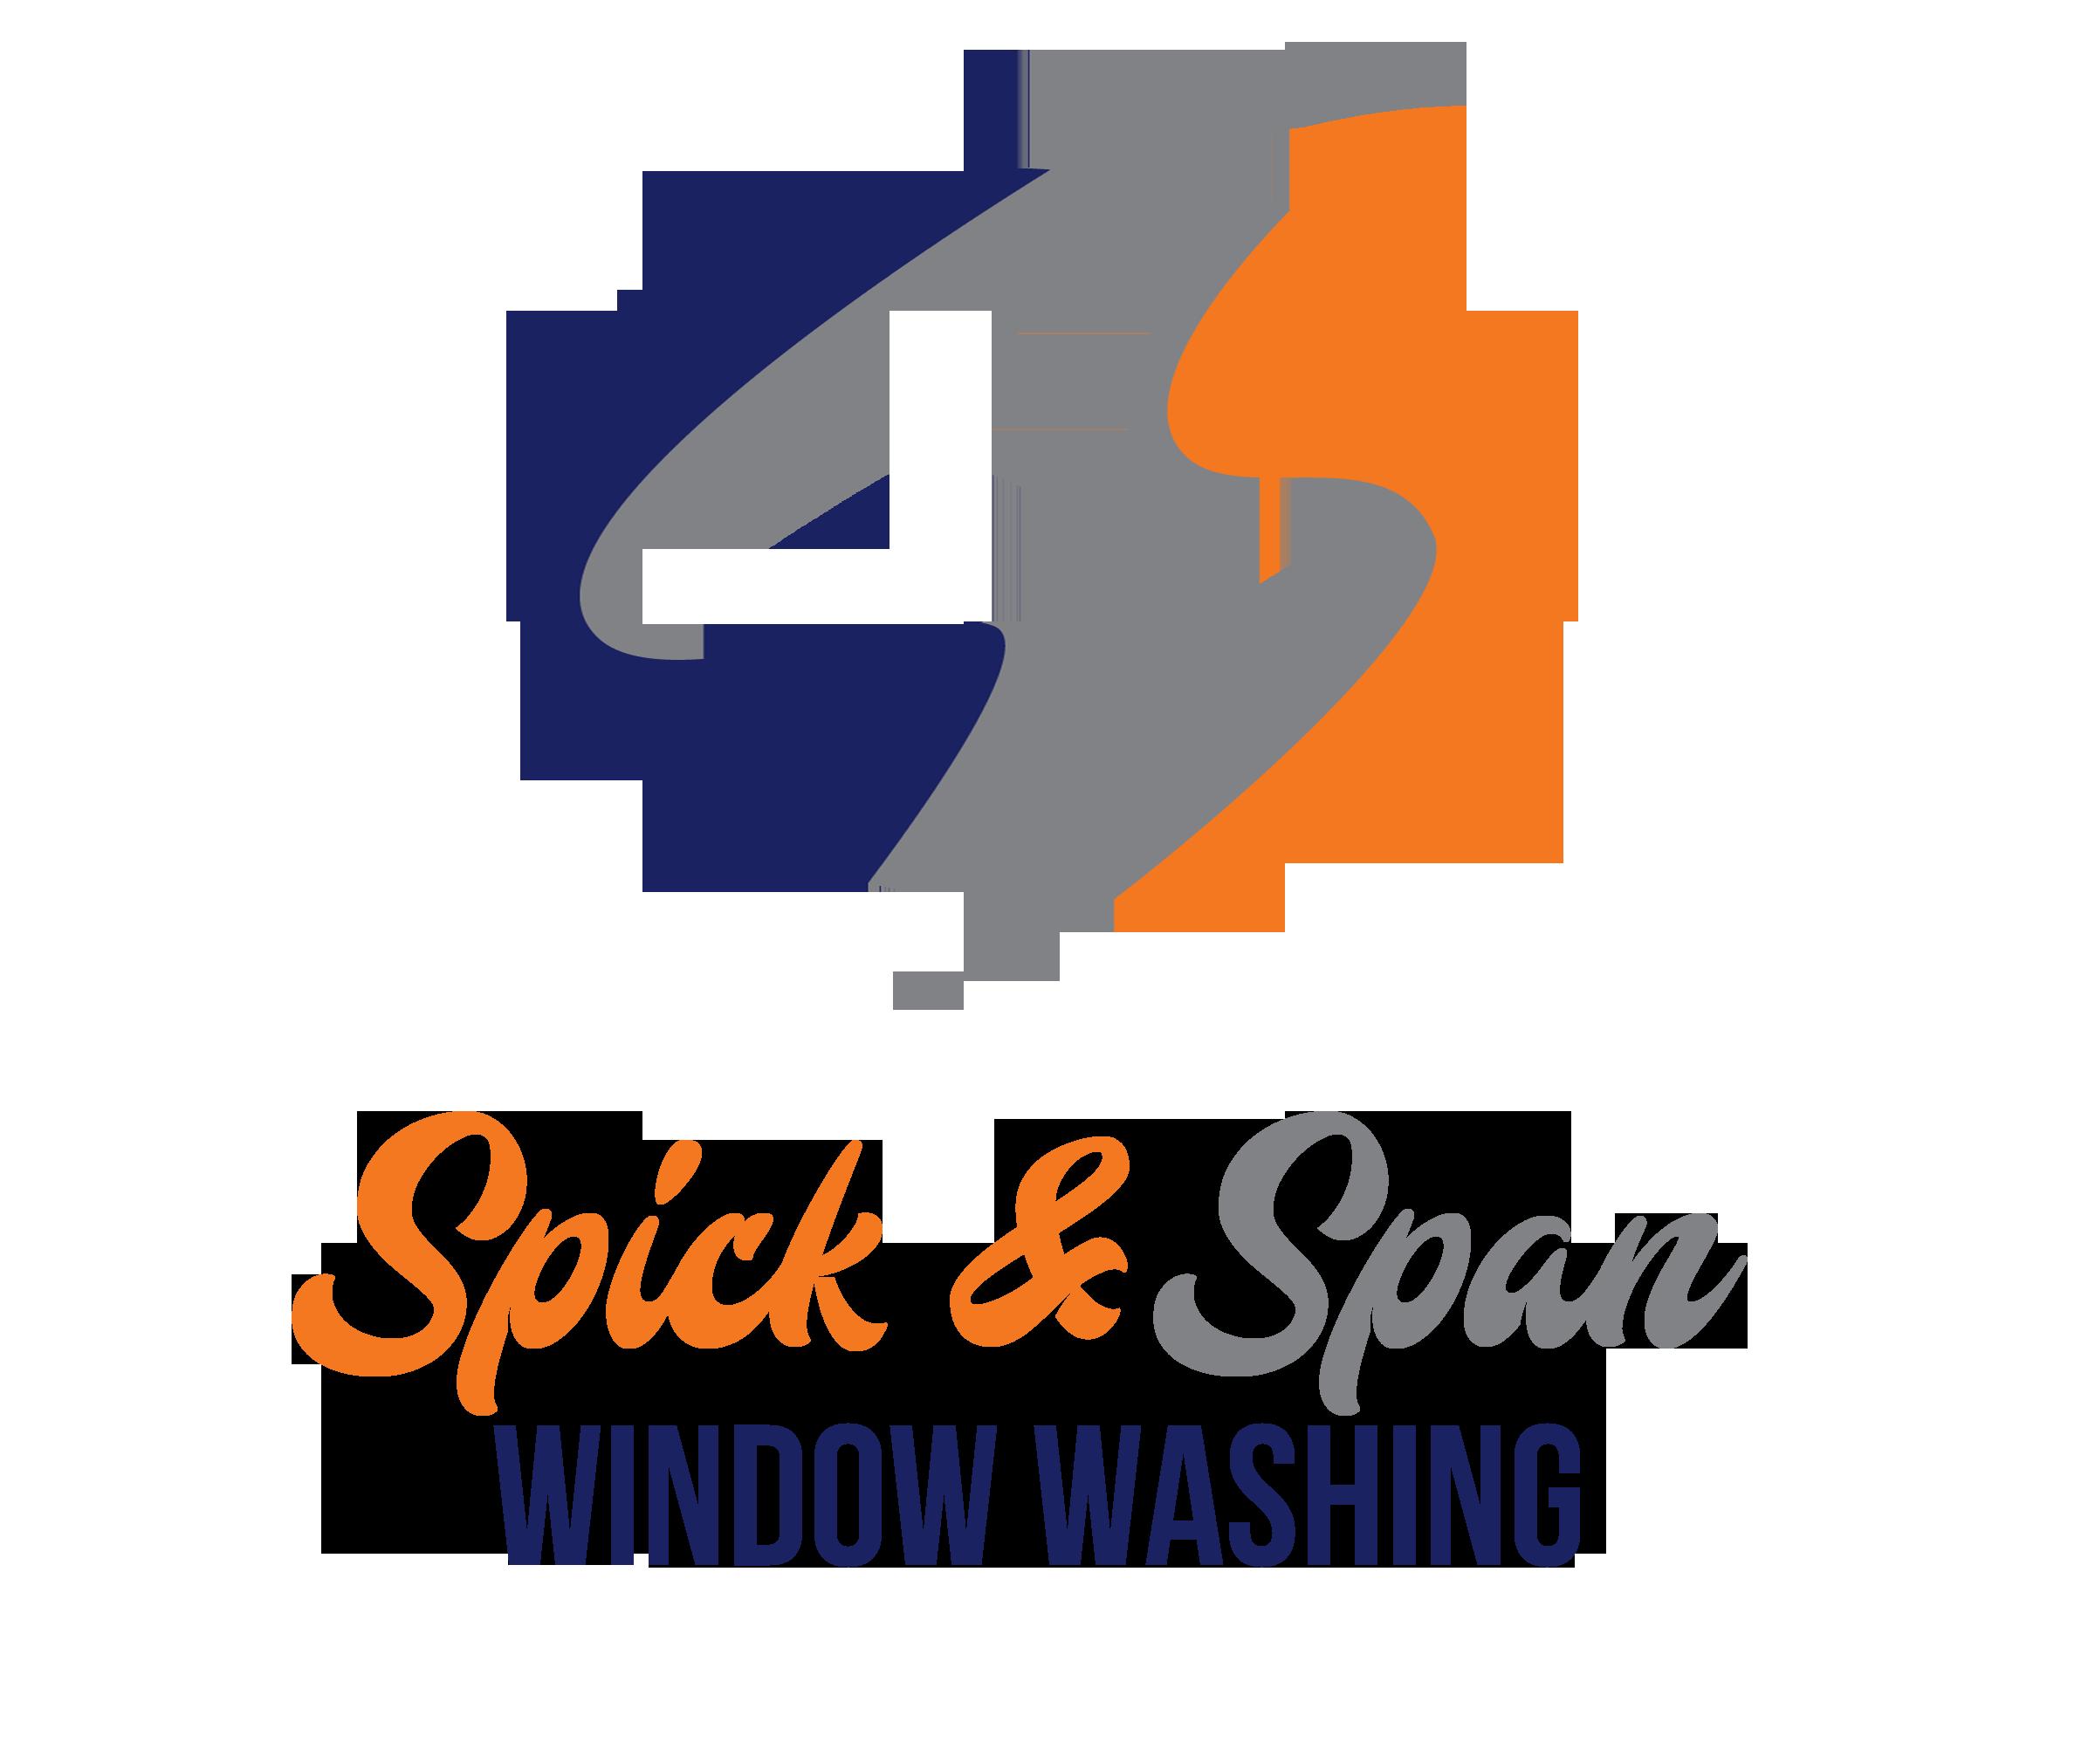 Spick & Span Window Washing Cincinnati